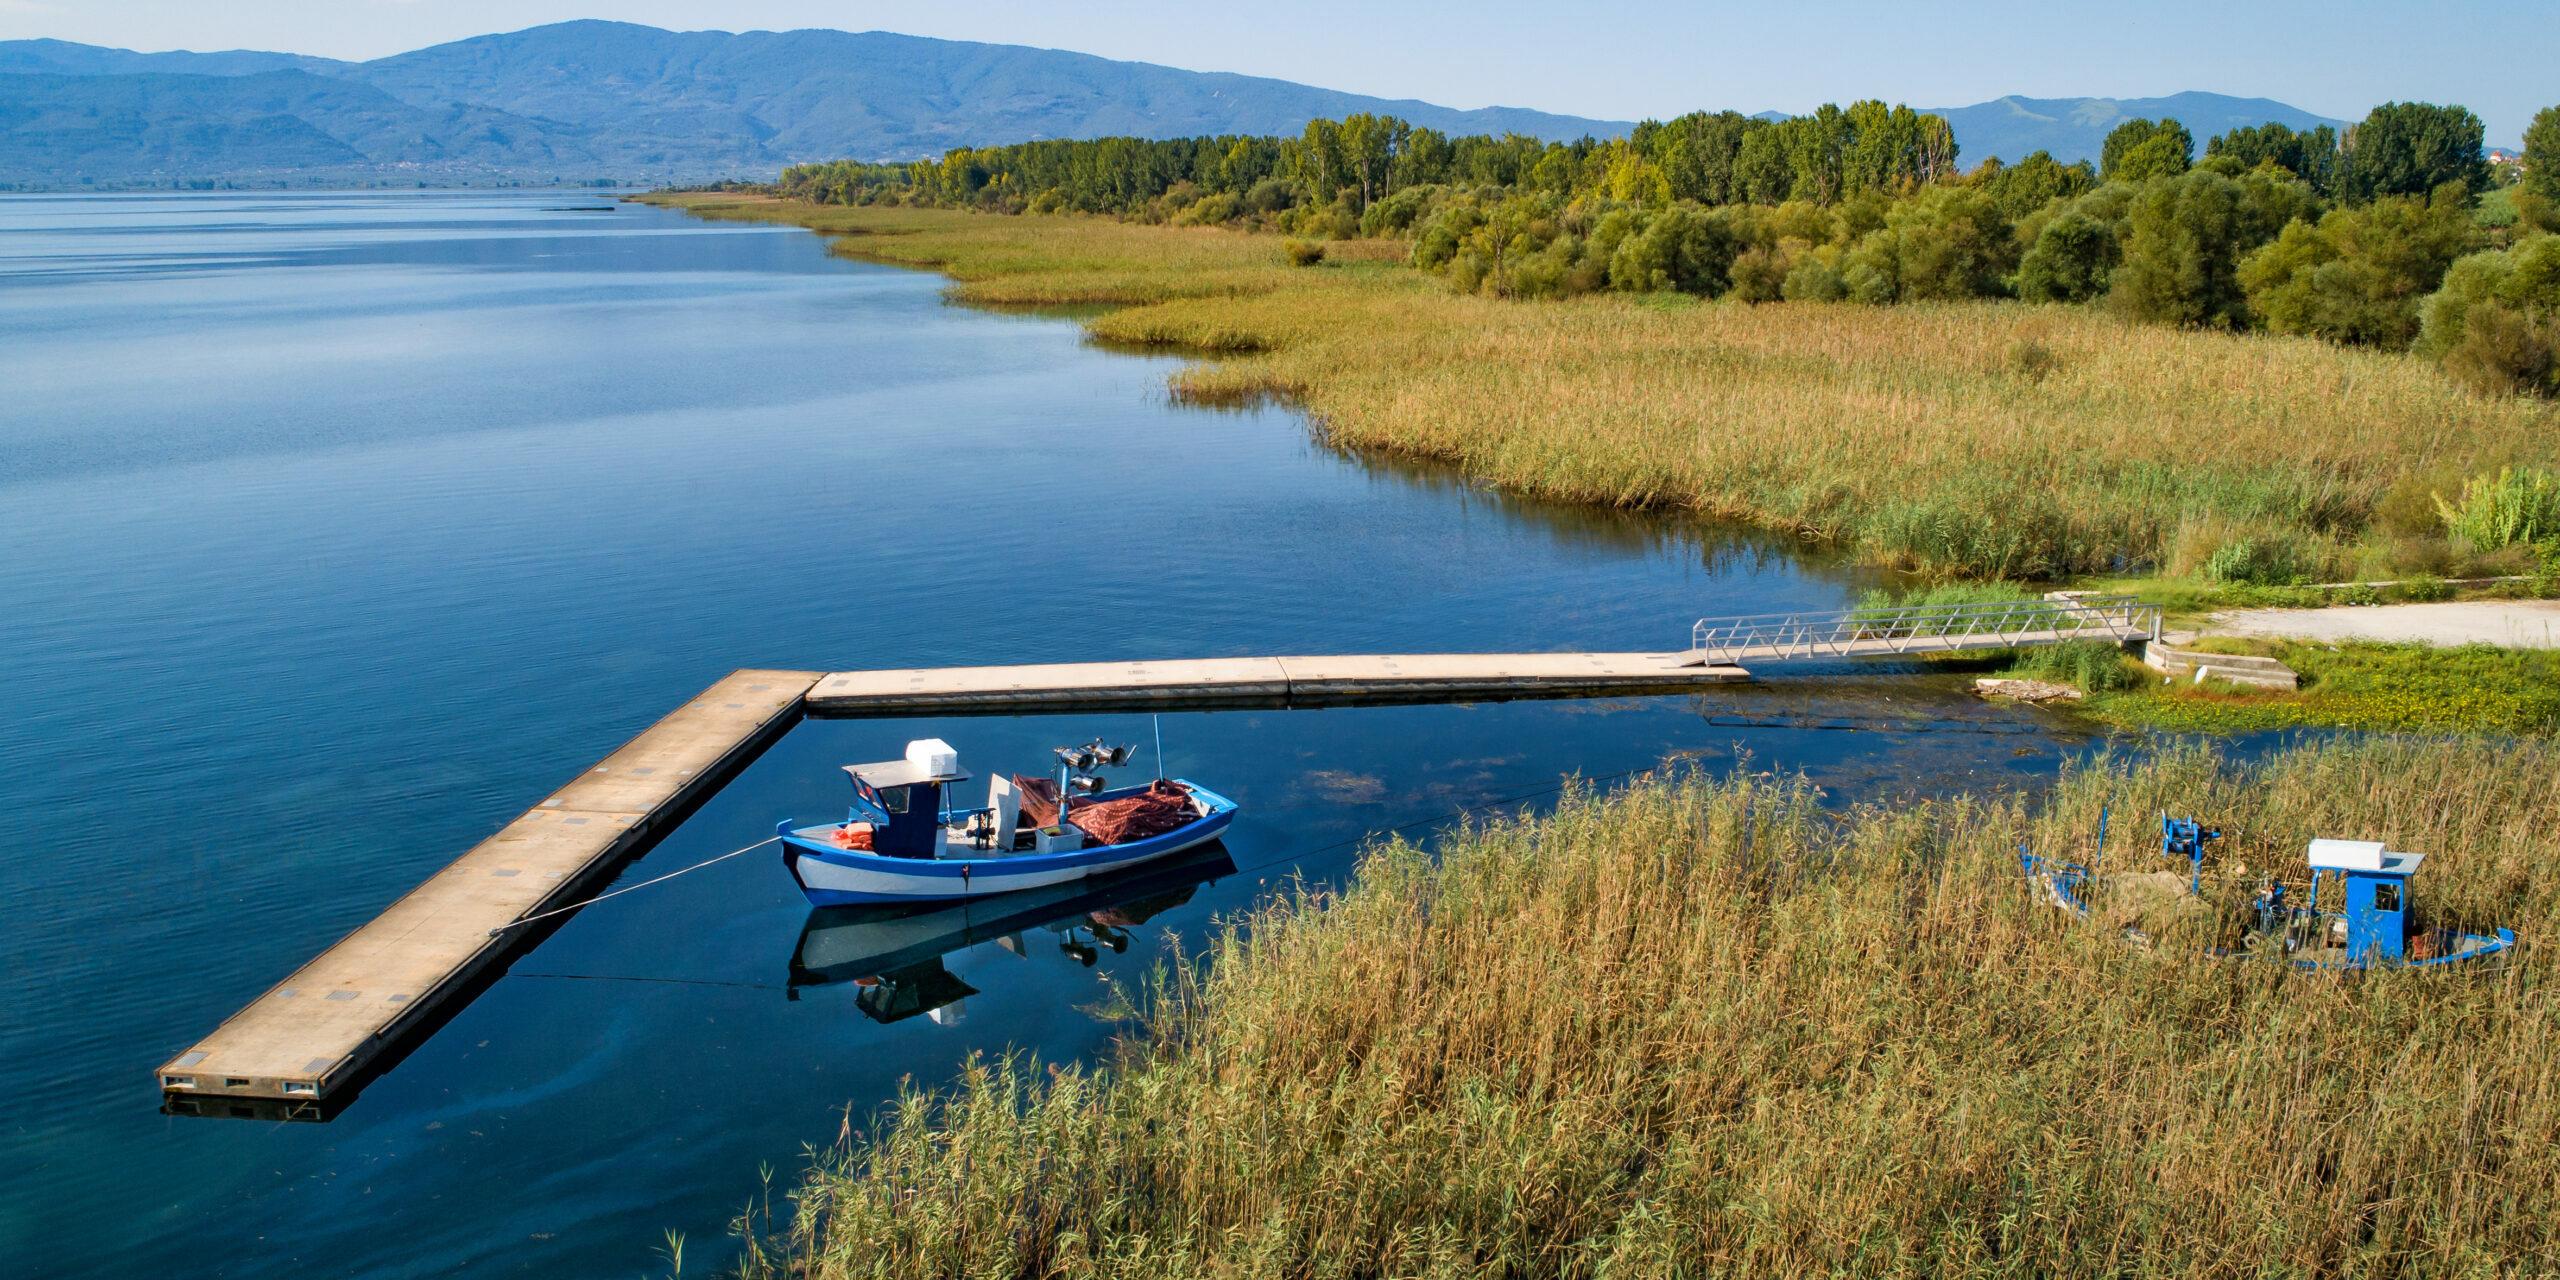 Aitoloakarnania: Lake Trichonida, the twin and impressive waterfalls of Greece